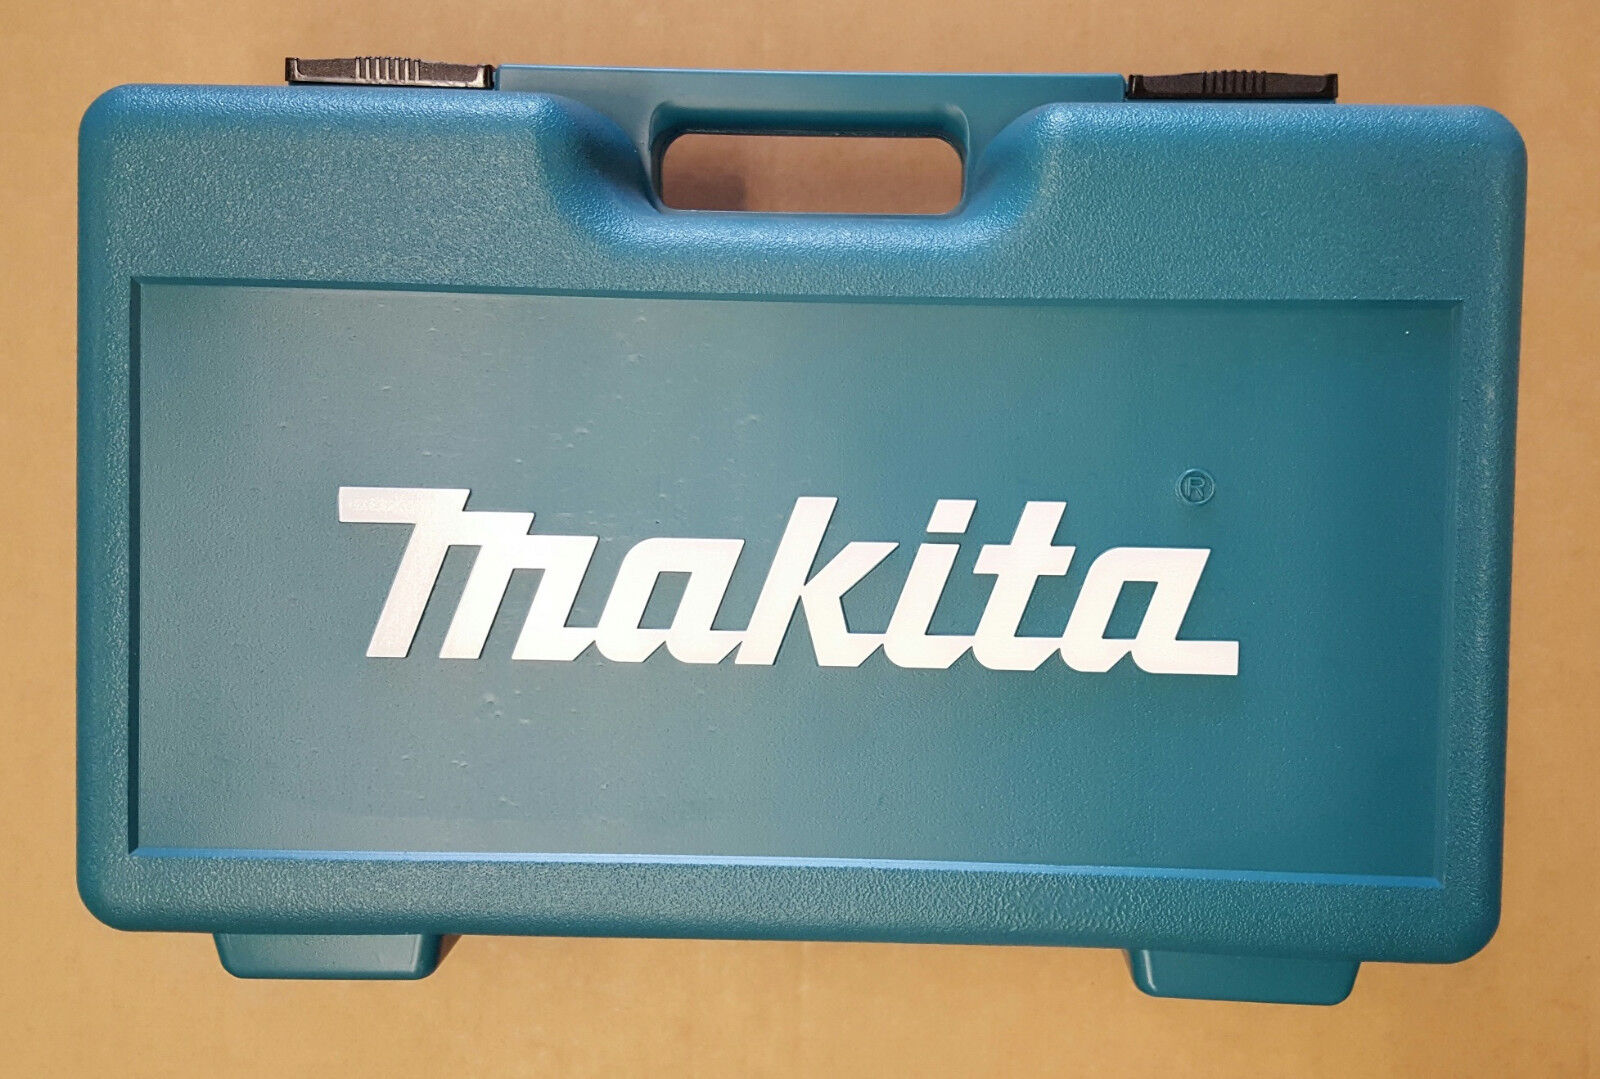 Makita Winkelschleifer Absaughaube 115 125 mm Beton 195239-9 115-125 mm